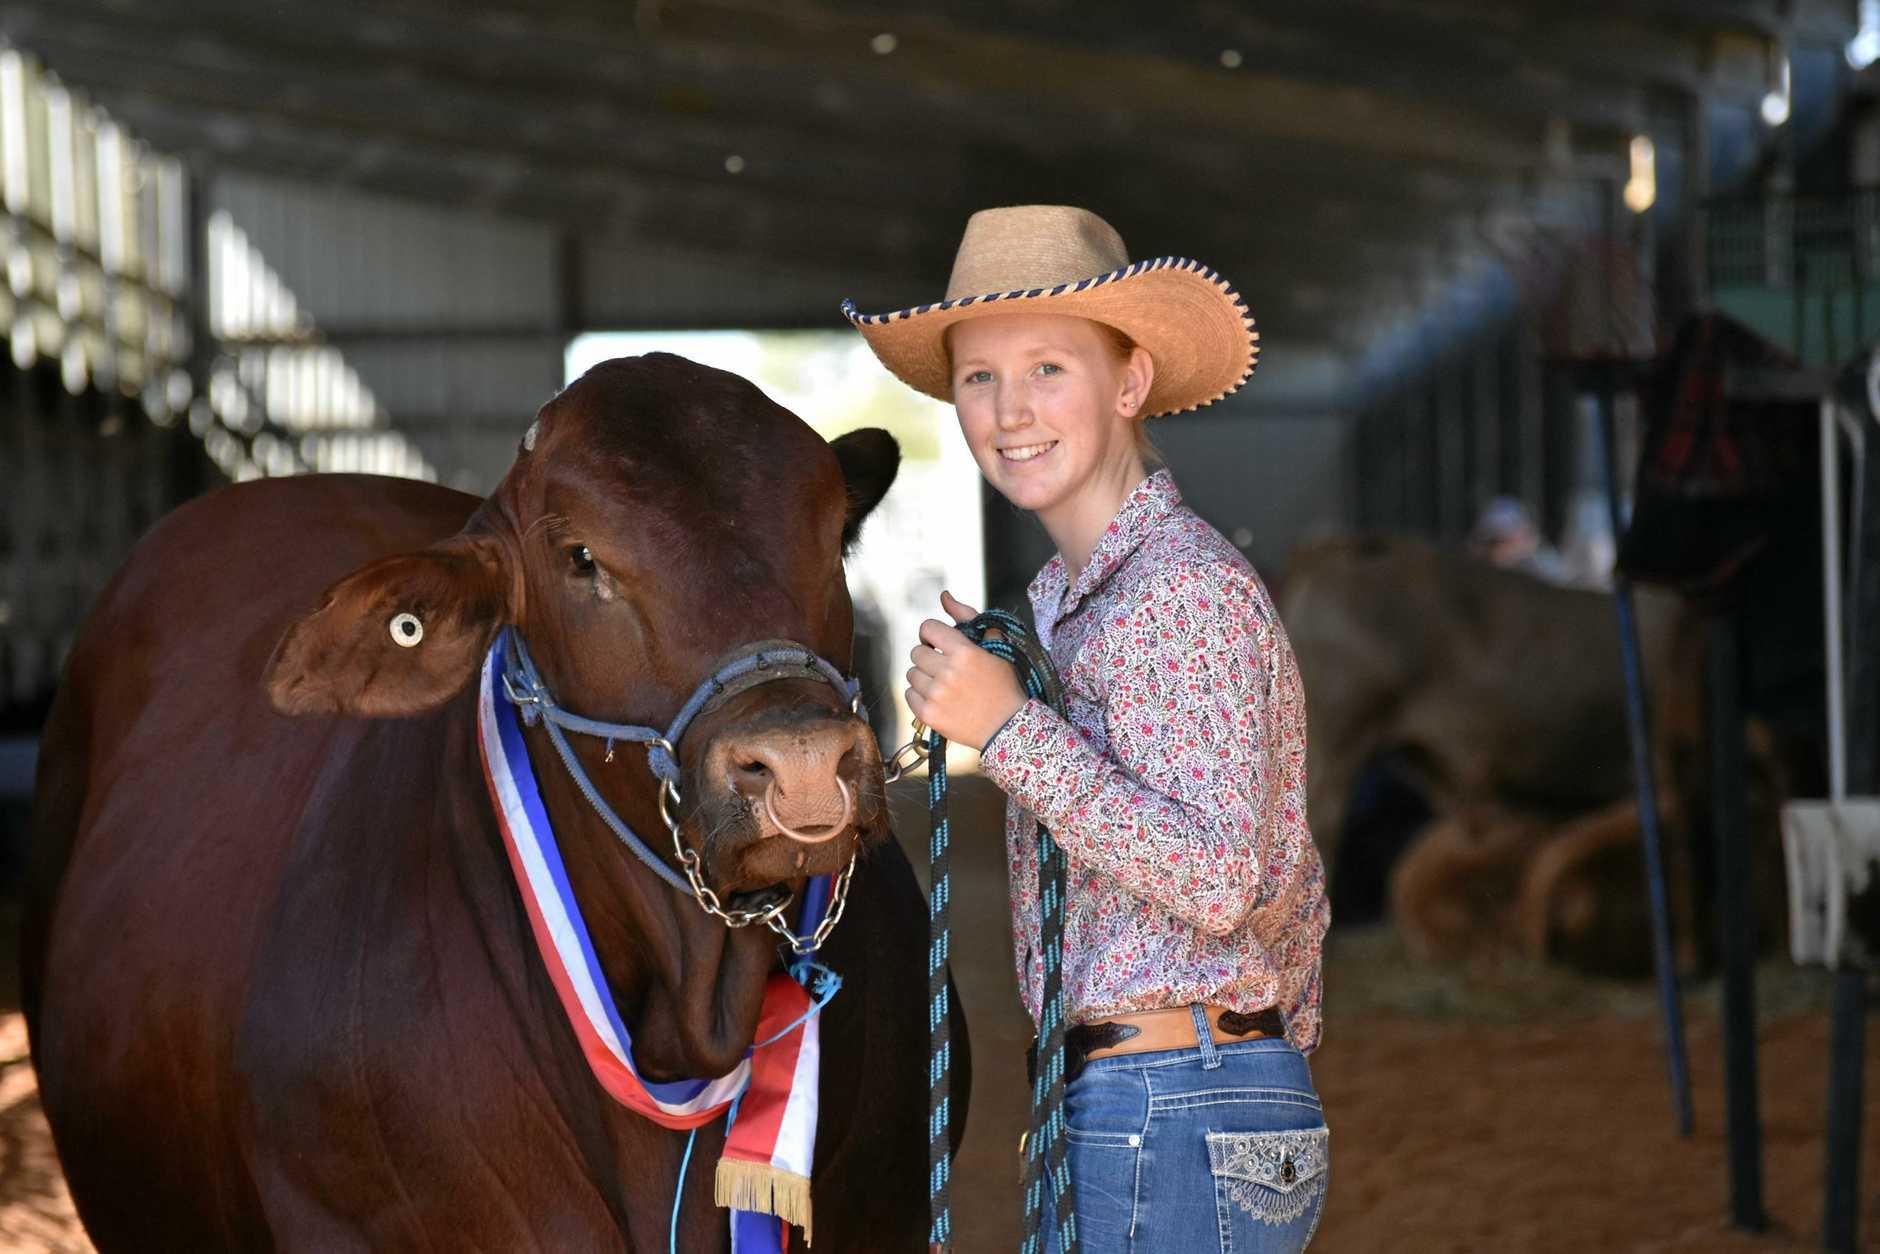 Rockhampton Agricultural Show Supreme Champion Bull Bilo High Commando with leader Candice Rideout.